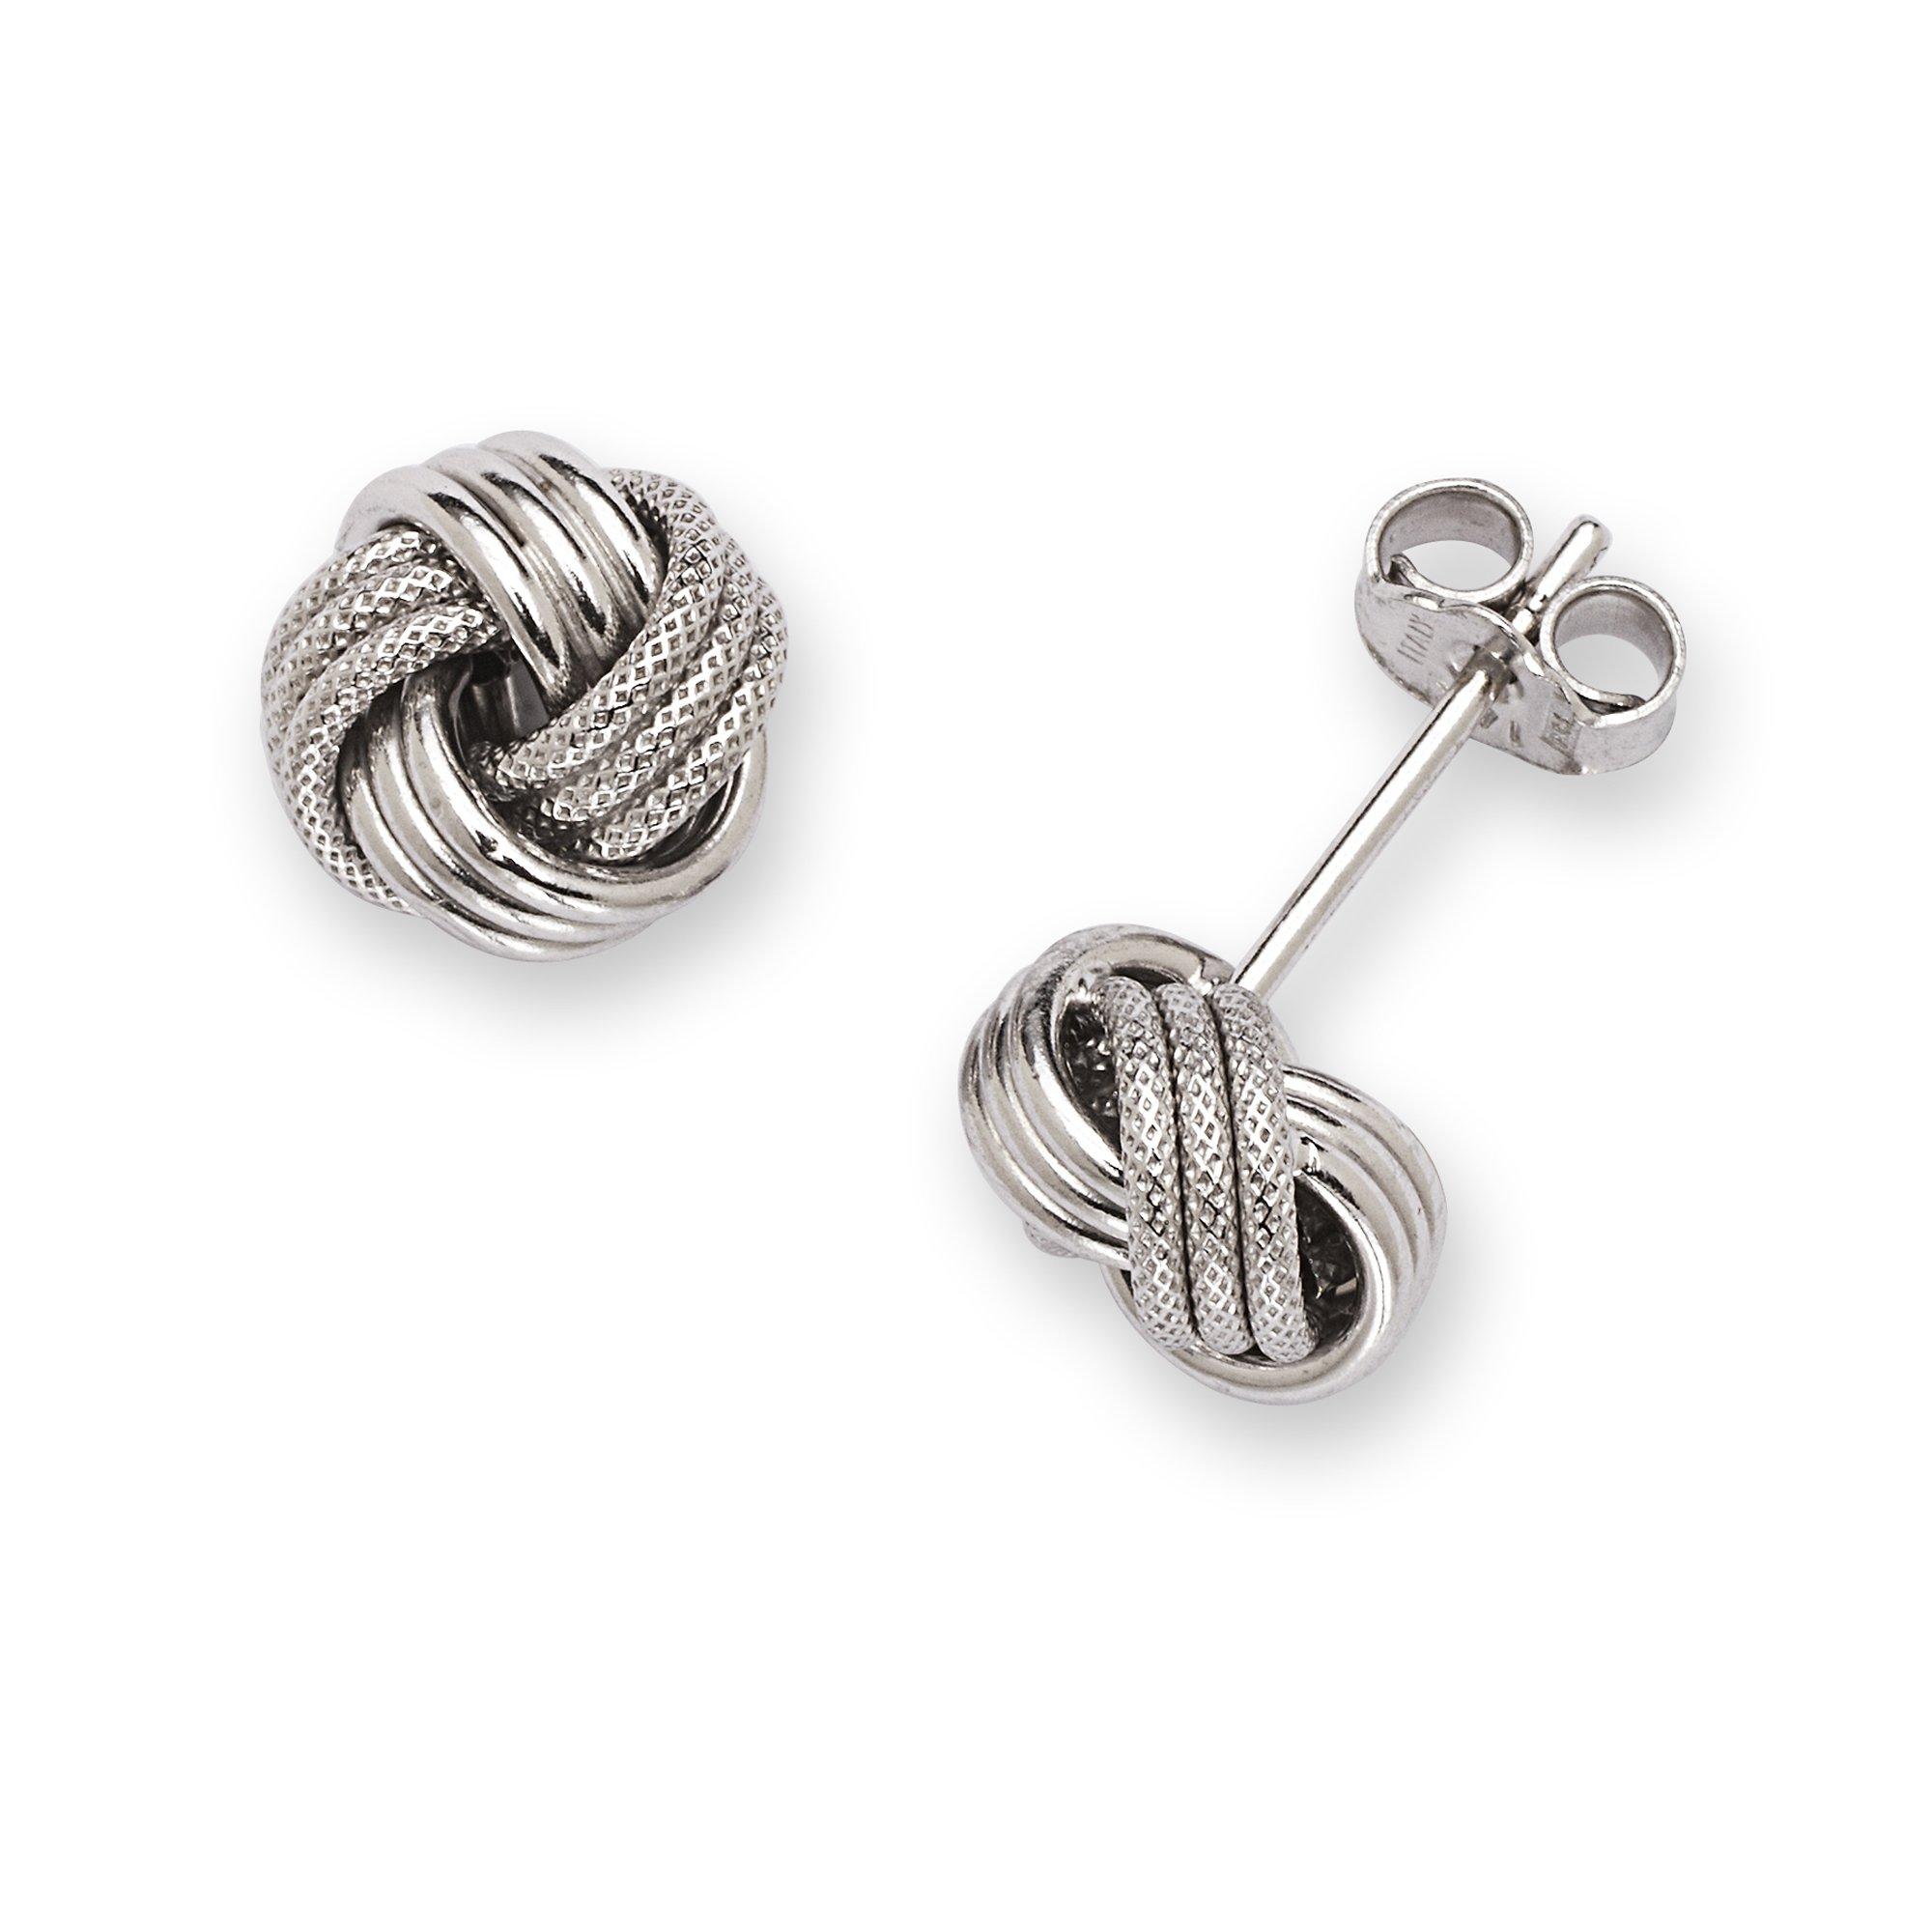 14k White Gold Polish Textured 8mm Love Knot Earrings - JewelryWeb